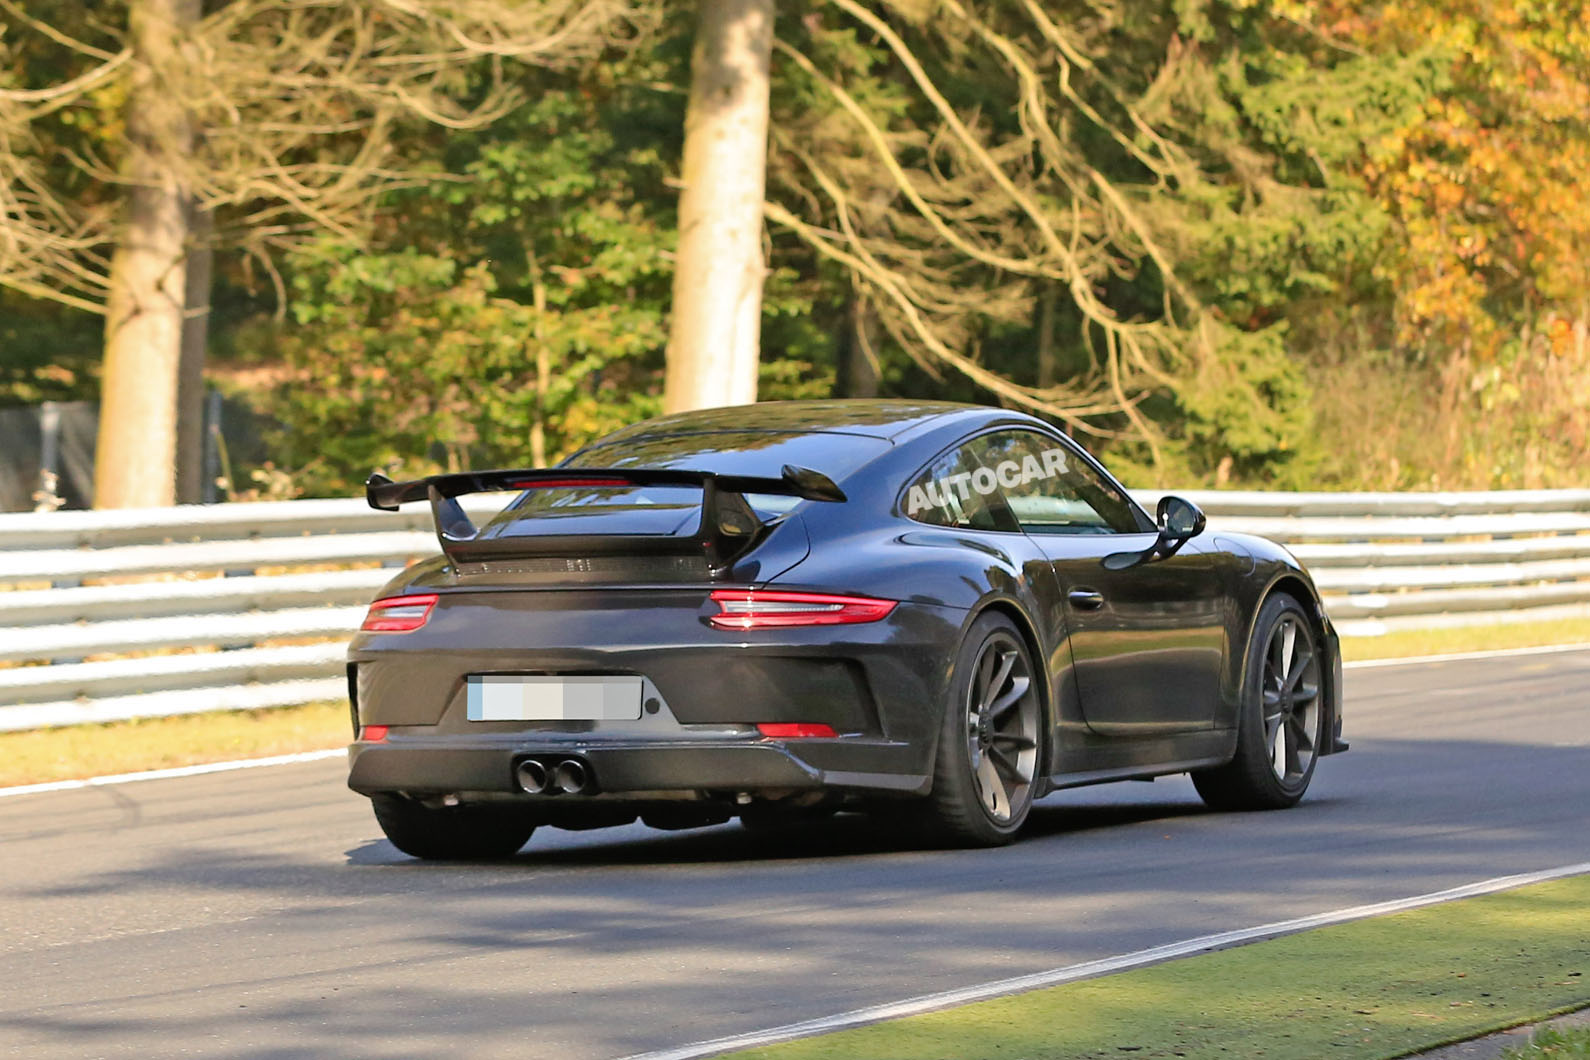 Porsche 911 gt3 rs review 2017 autocar - An Error Occurred